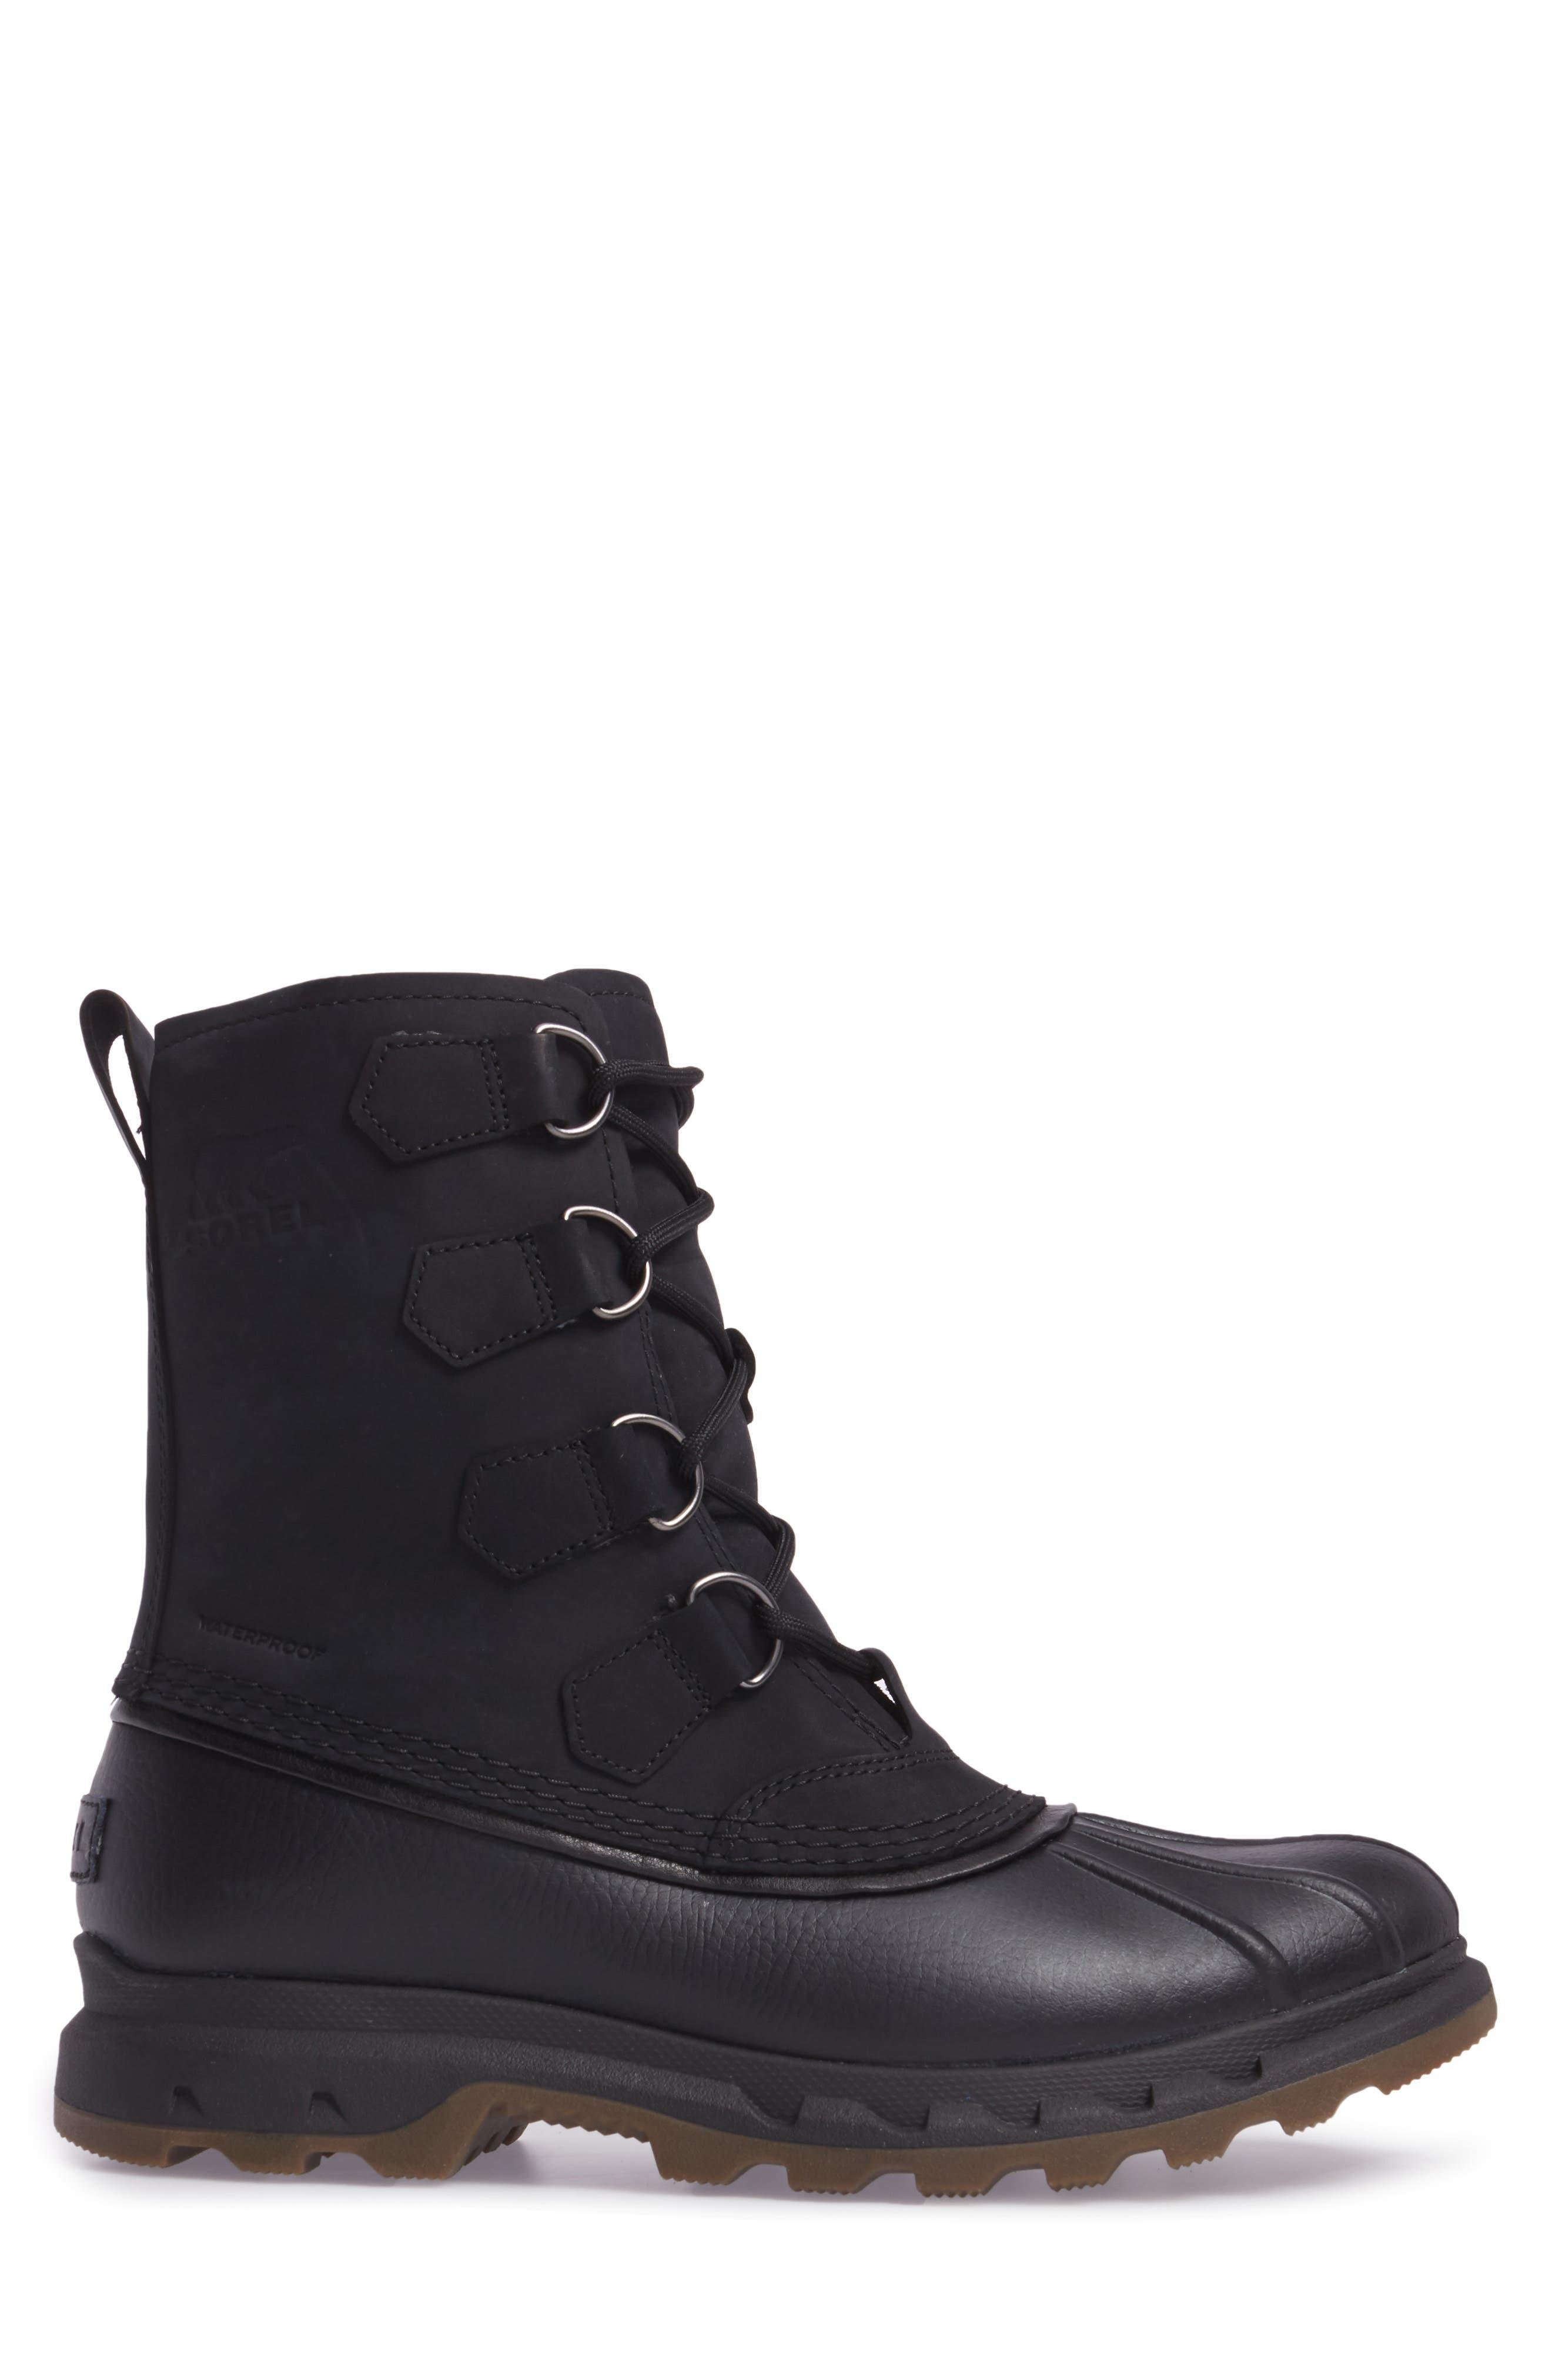 Portzman Classic Rain Boot,                             Alternate thumbnail 3, color,                             Black